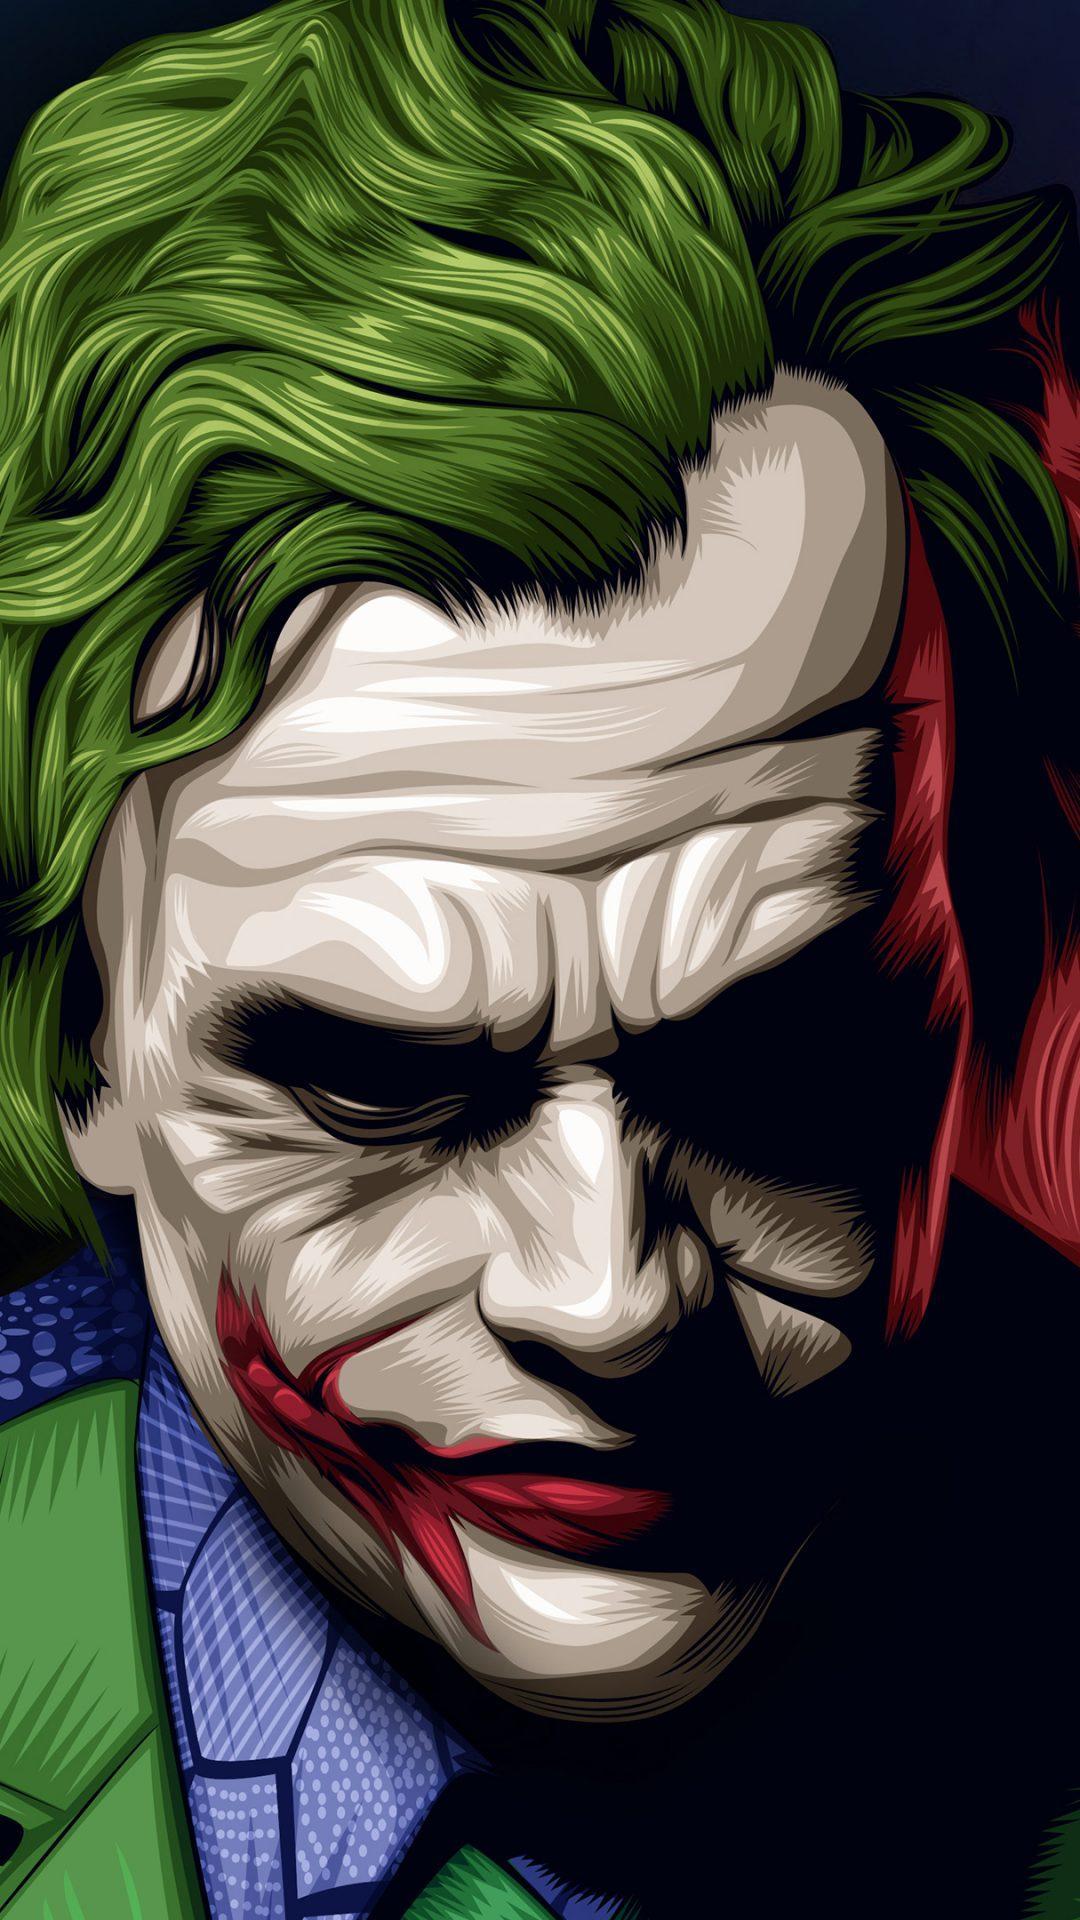 Joker Hd 2019 Wallpapers Wallpaper Cave